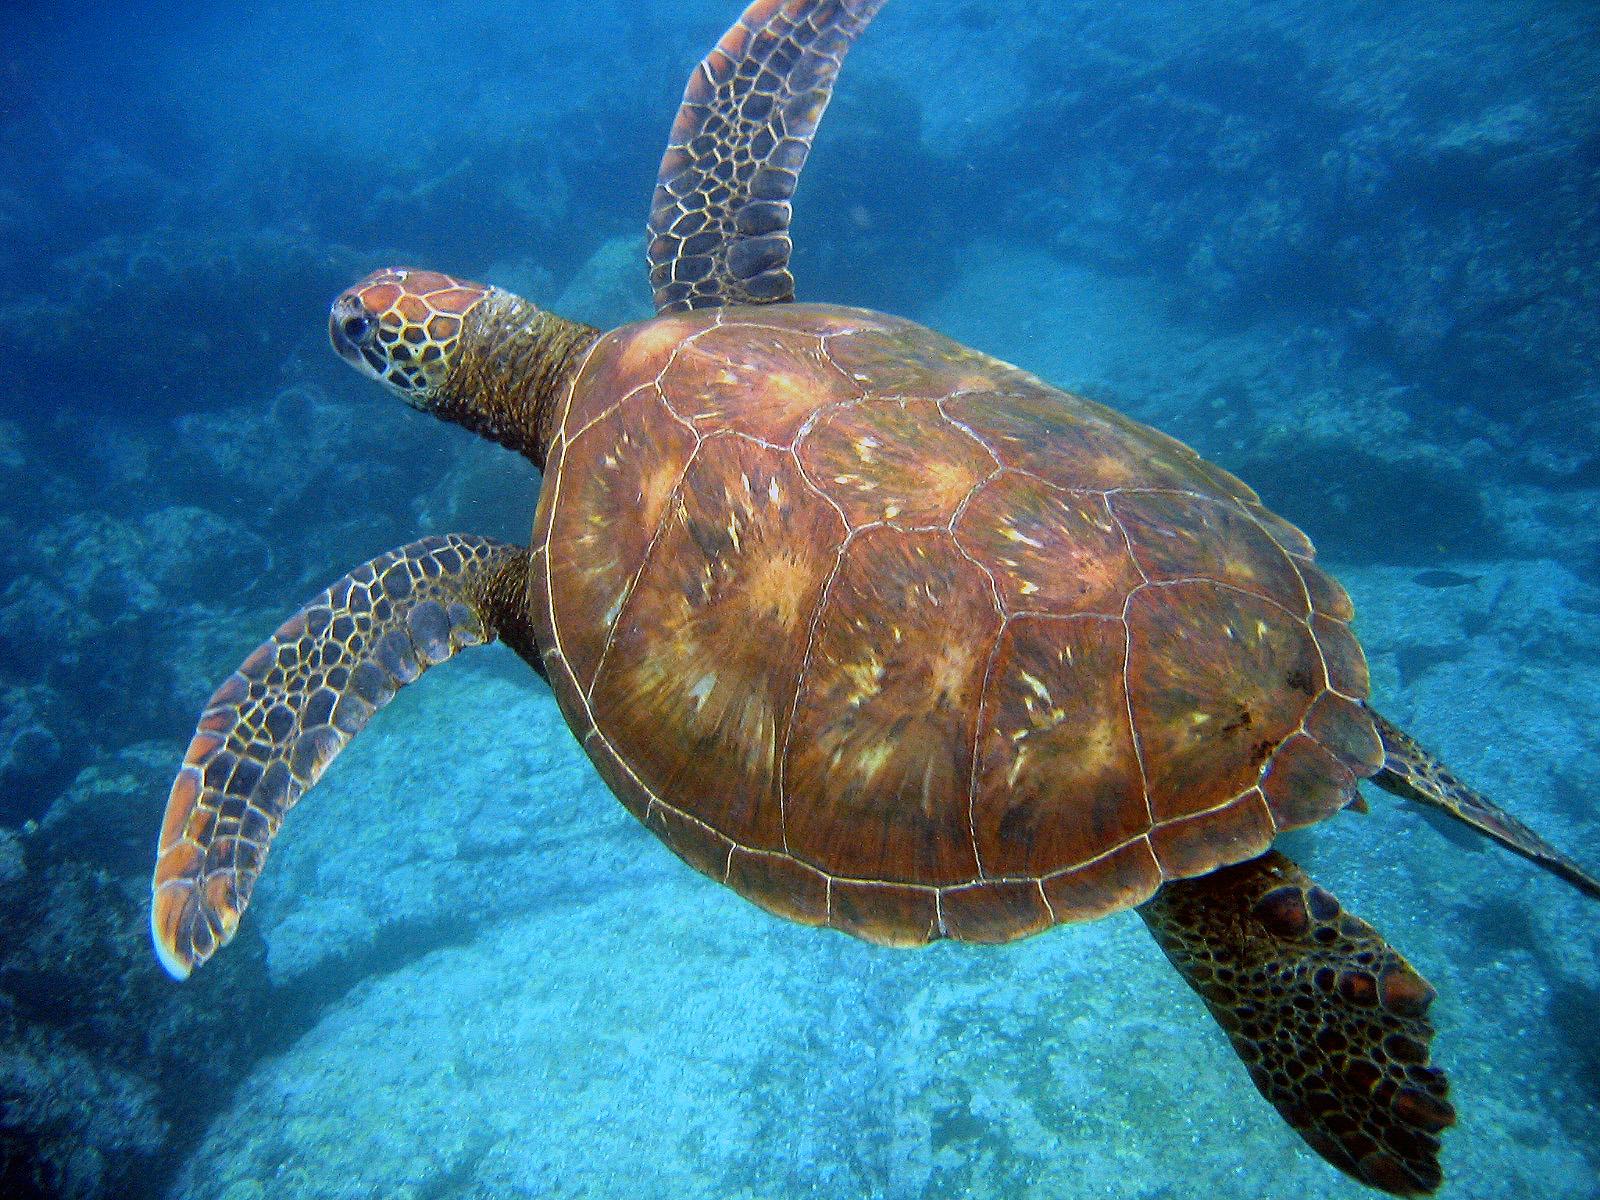 фото плывущая черепаха недостатка света